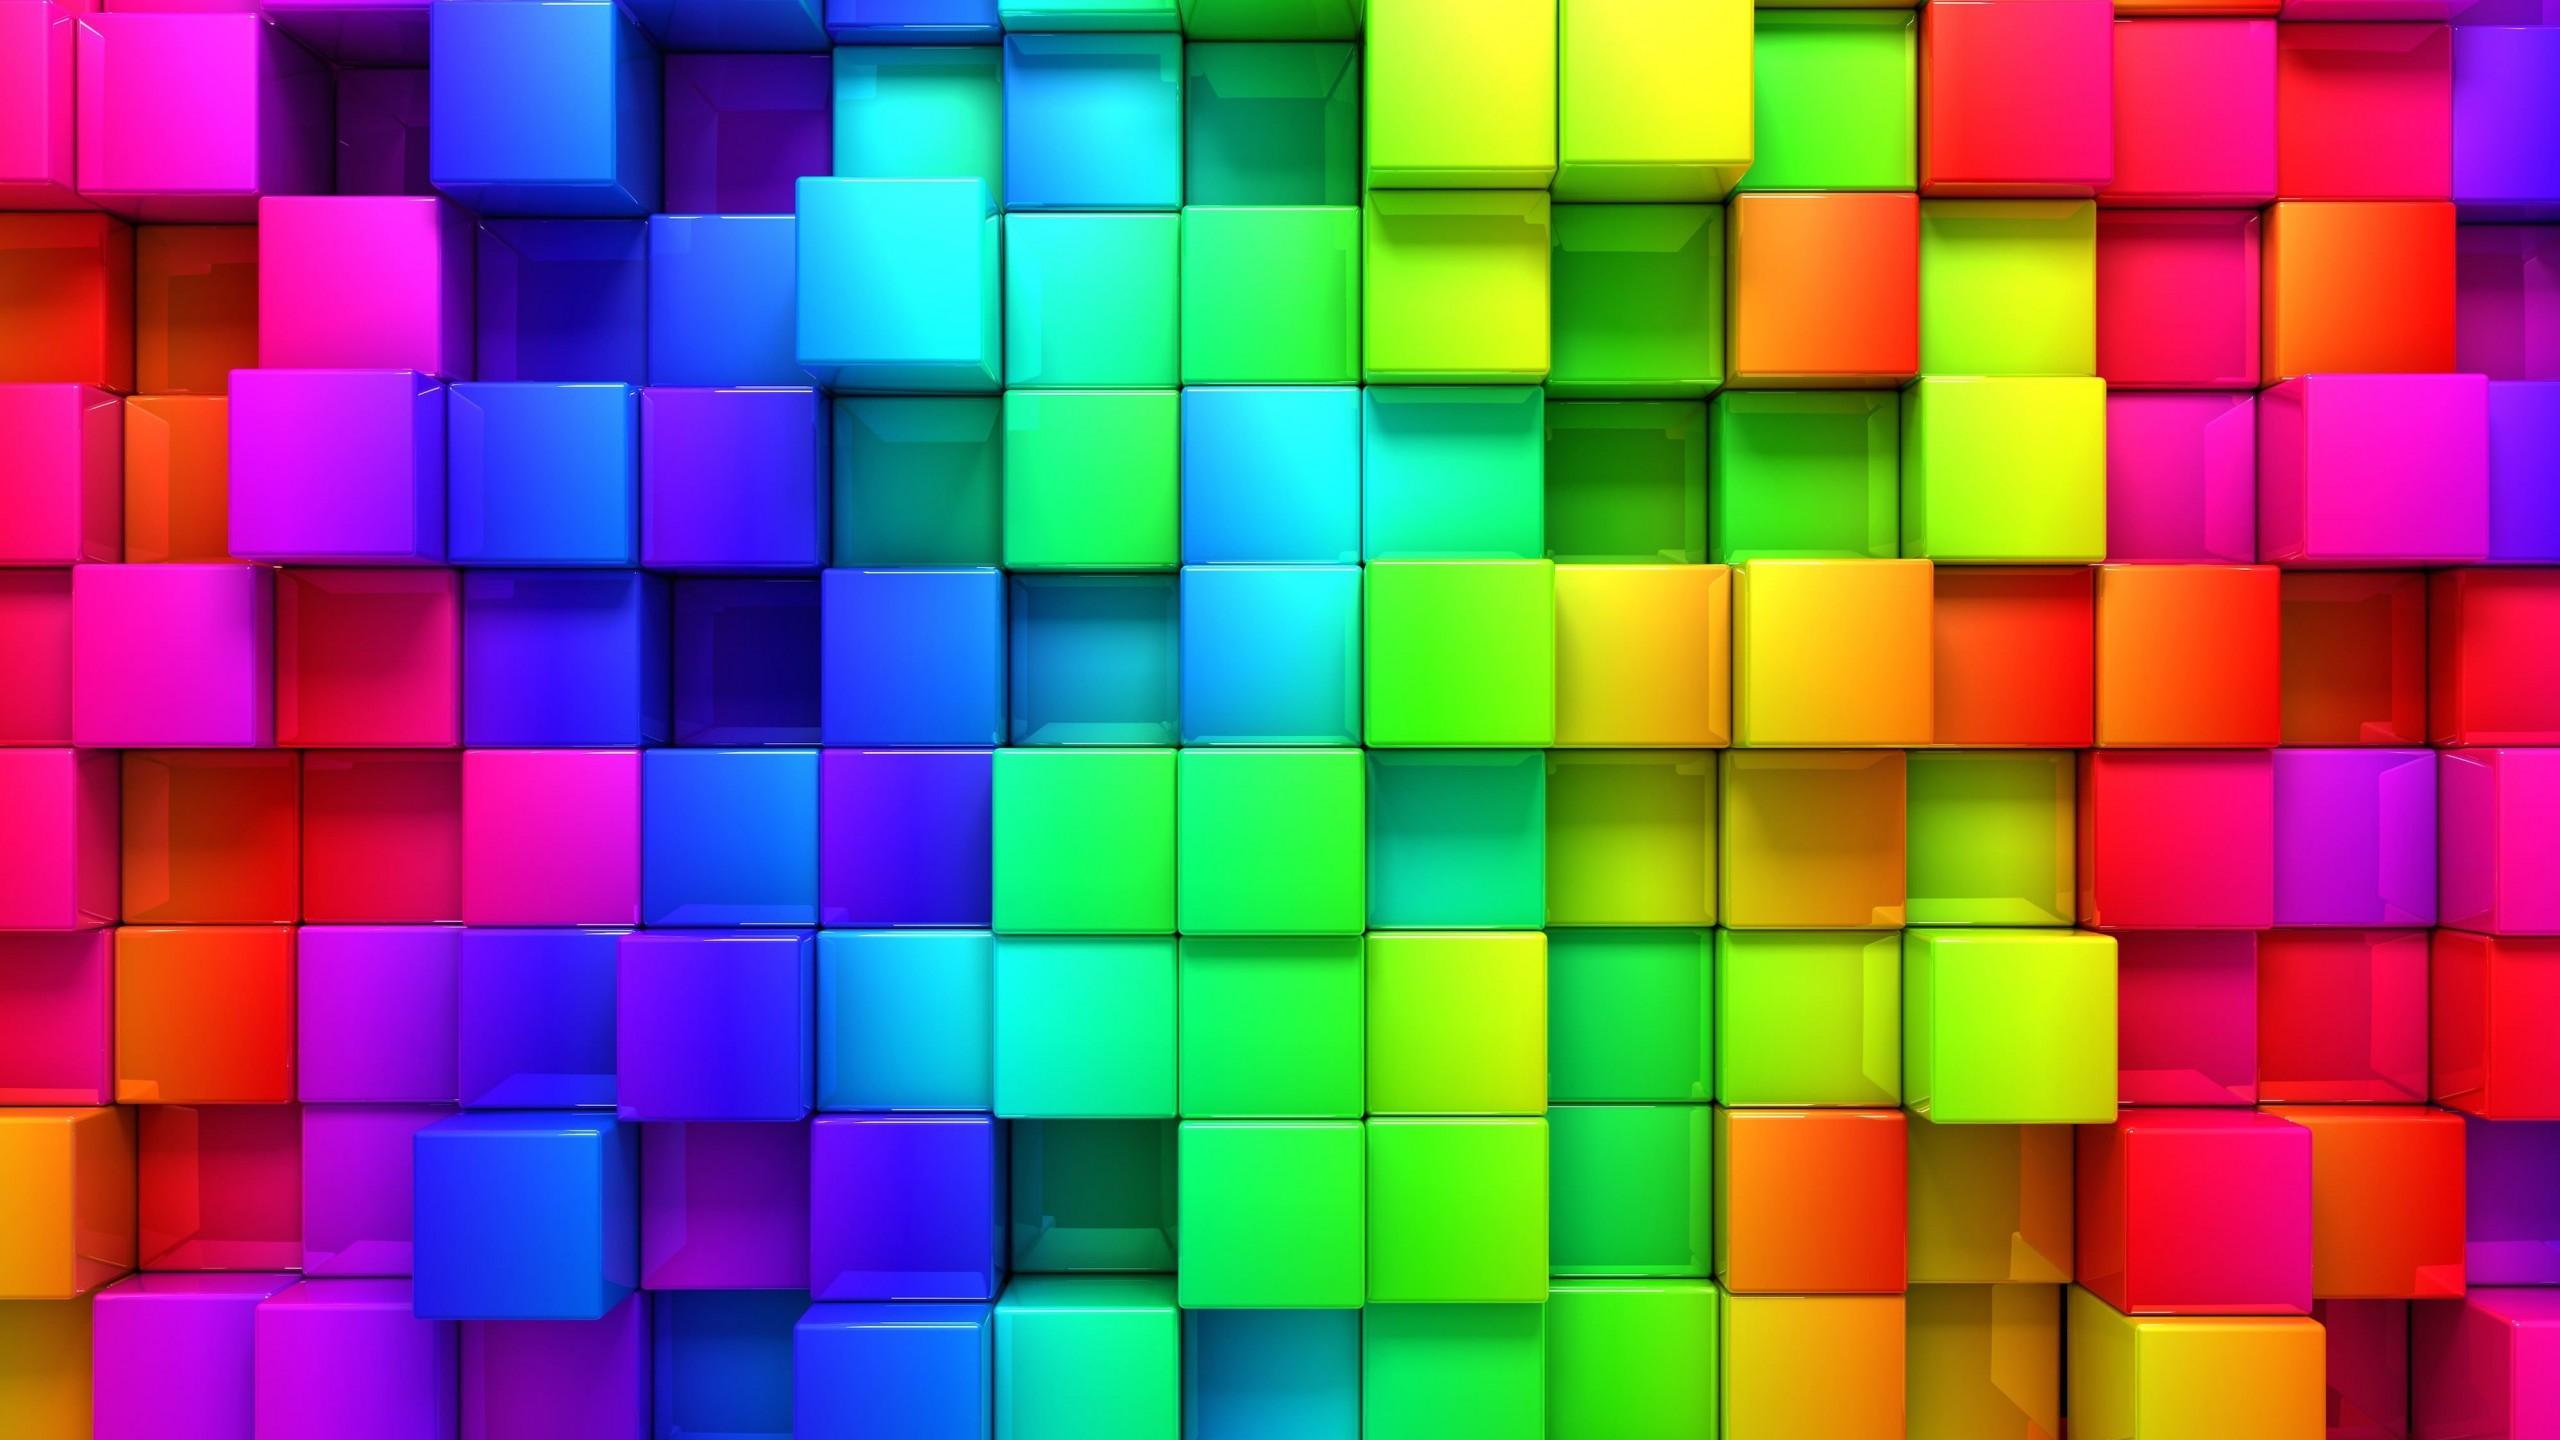 Cubic Rainbow HD wallpaper for 2560x1440 screens ...